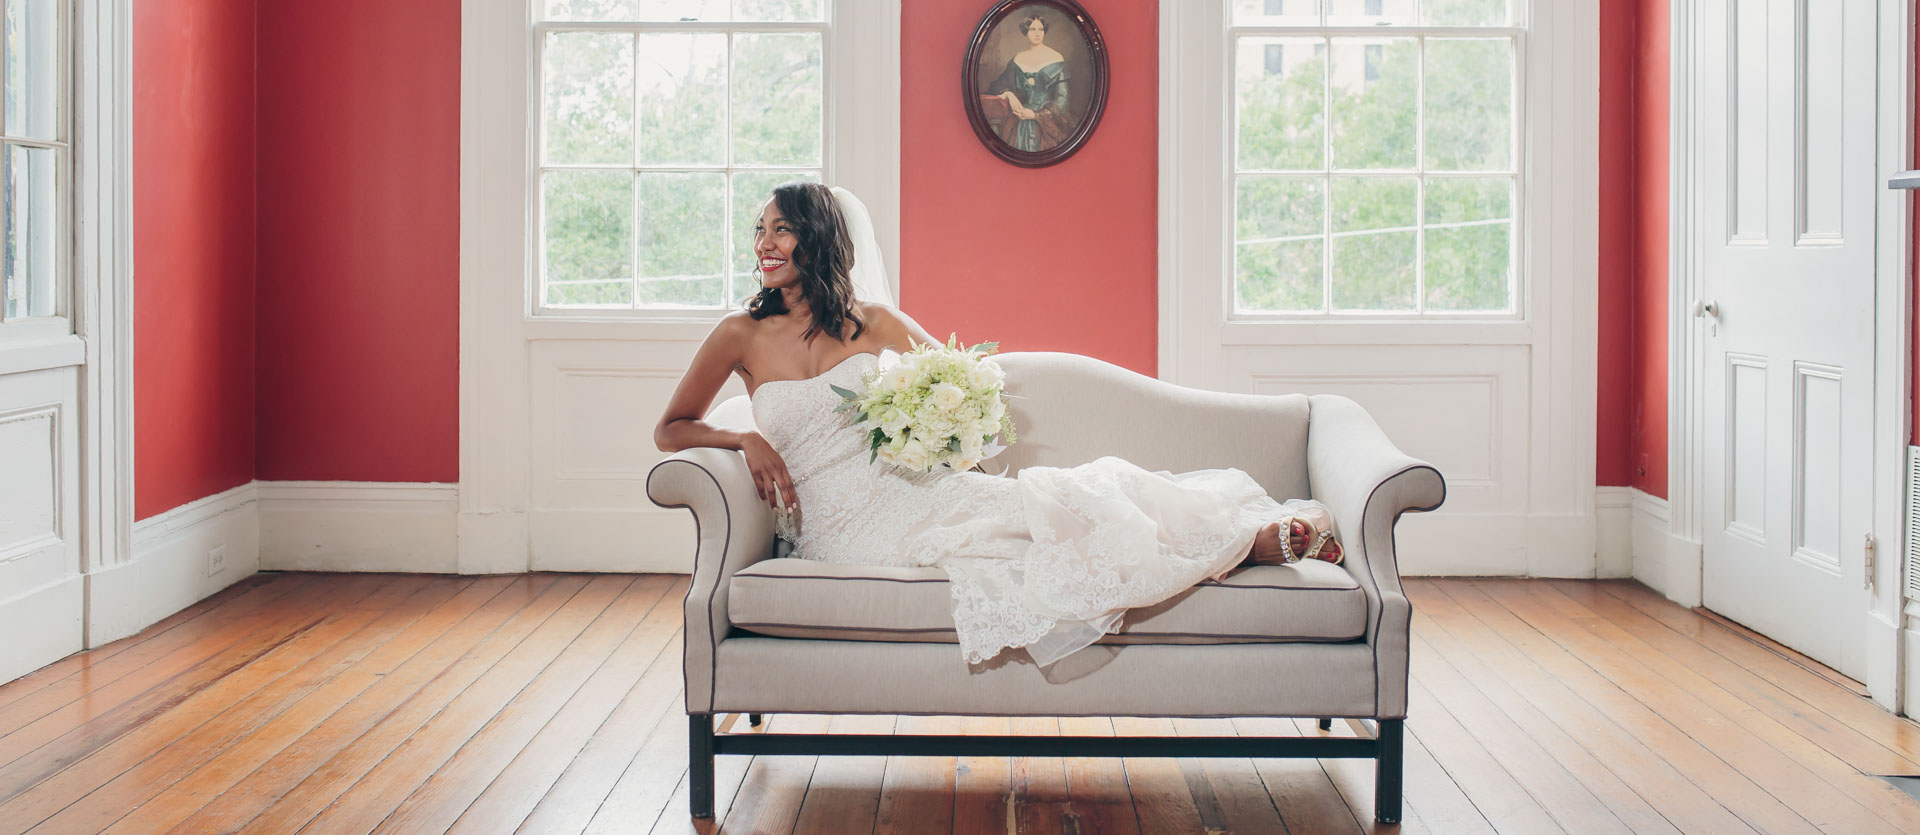 brittany-the-bride